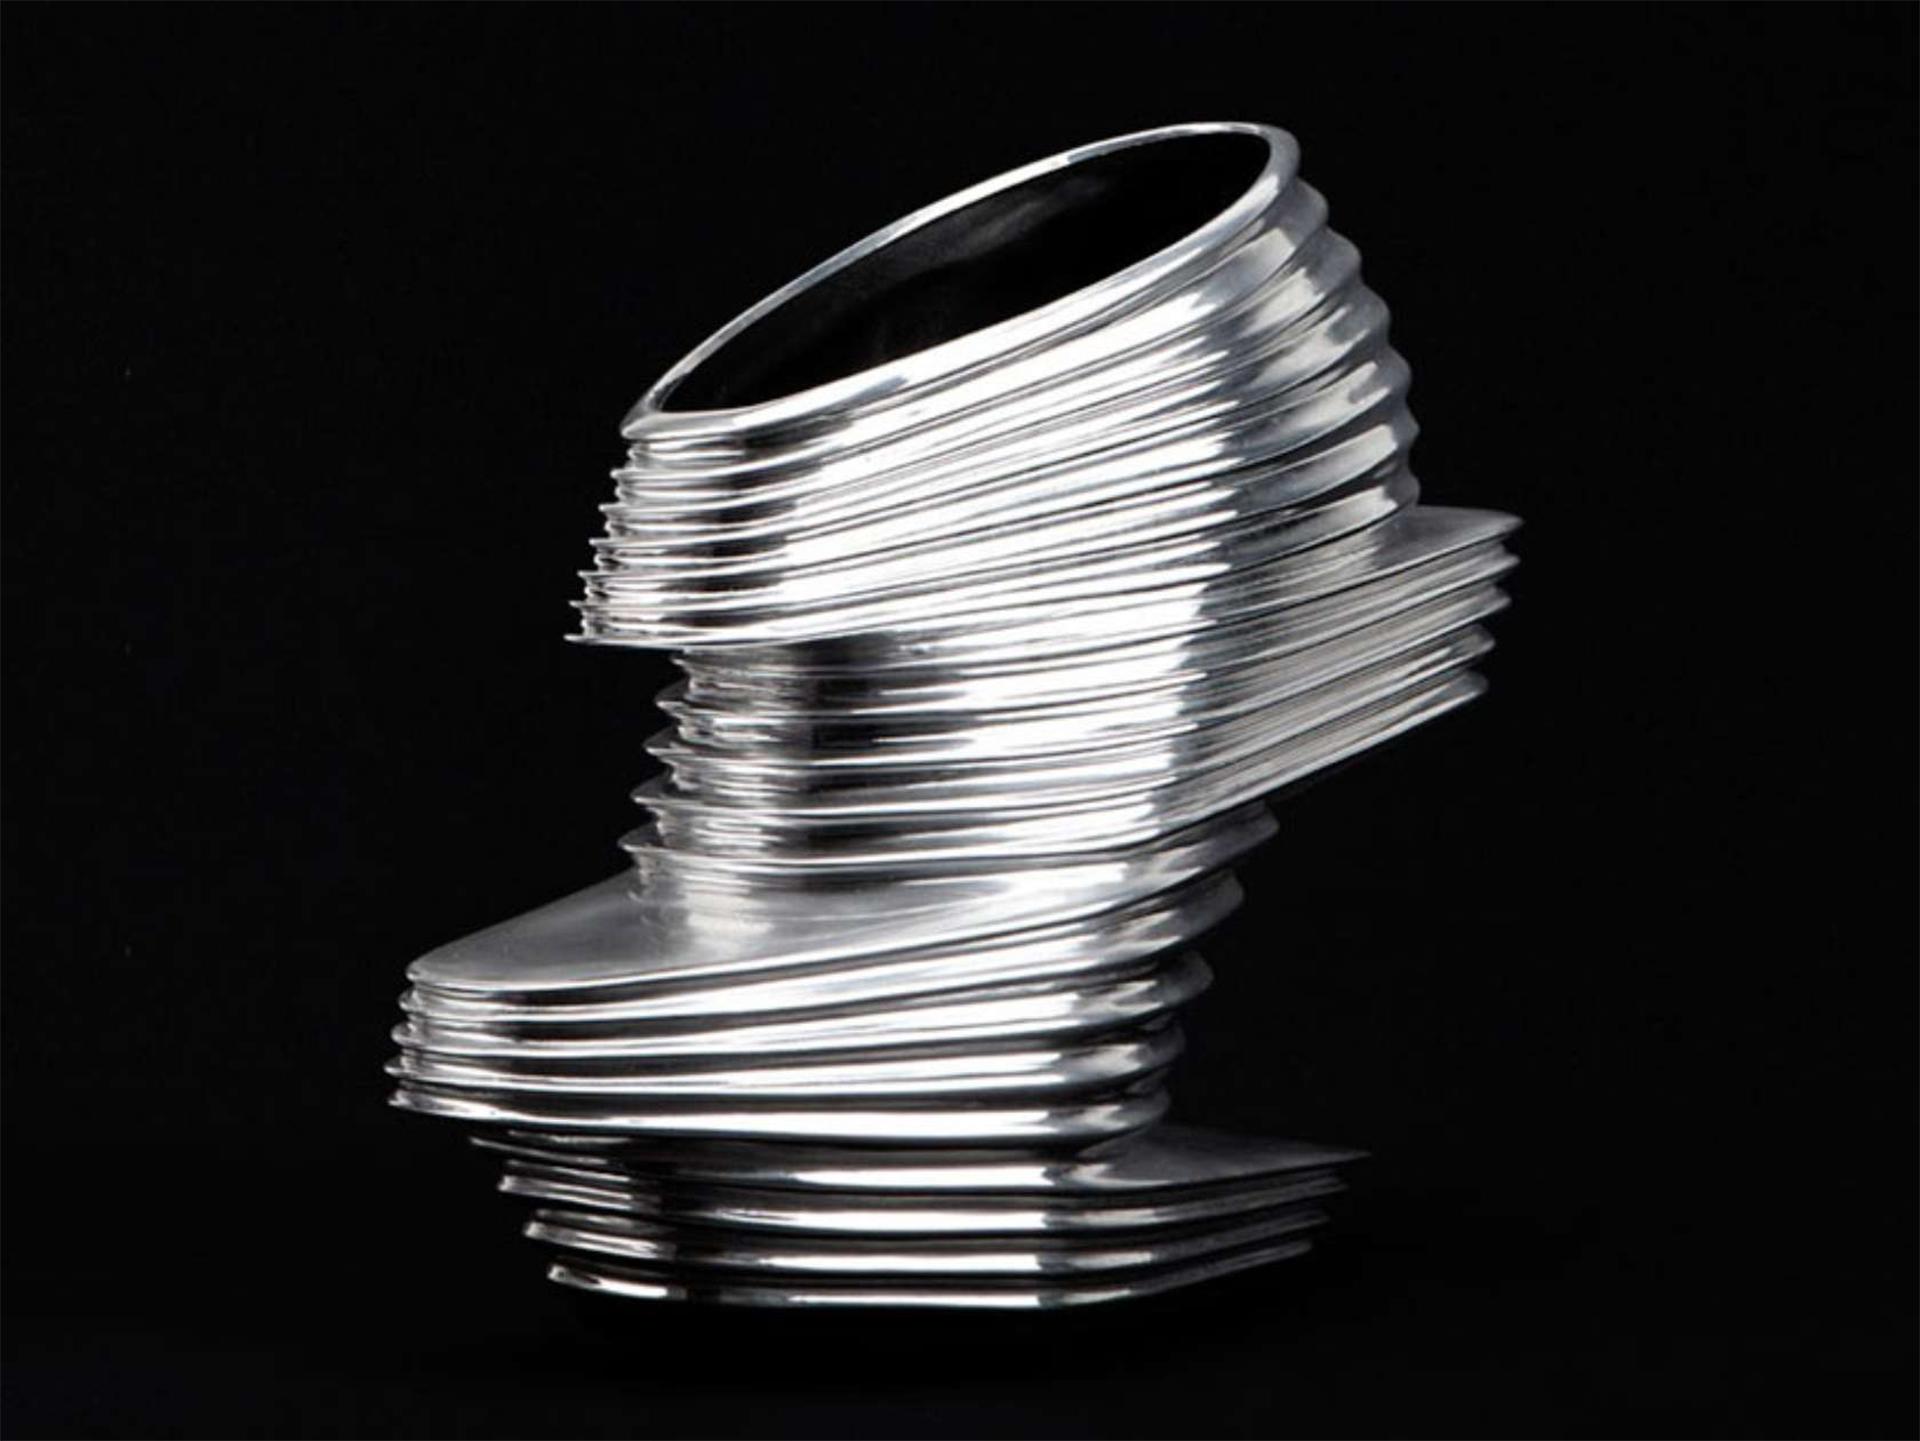 Hadid zaha designs shoes